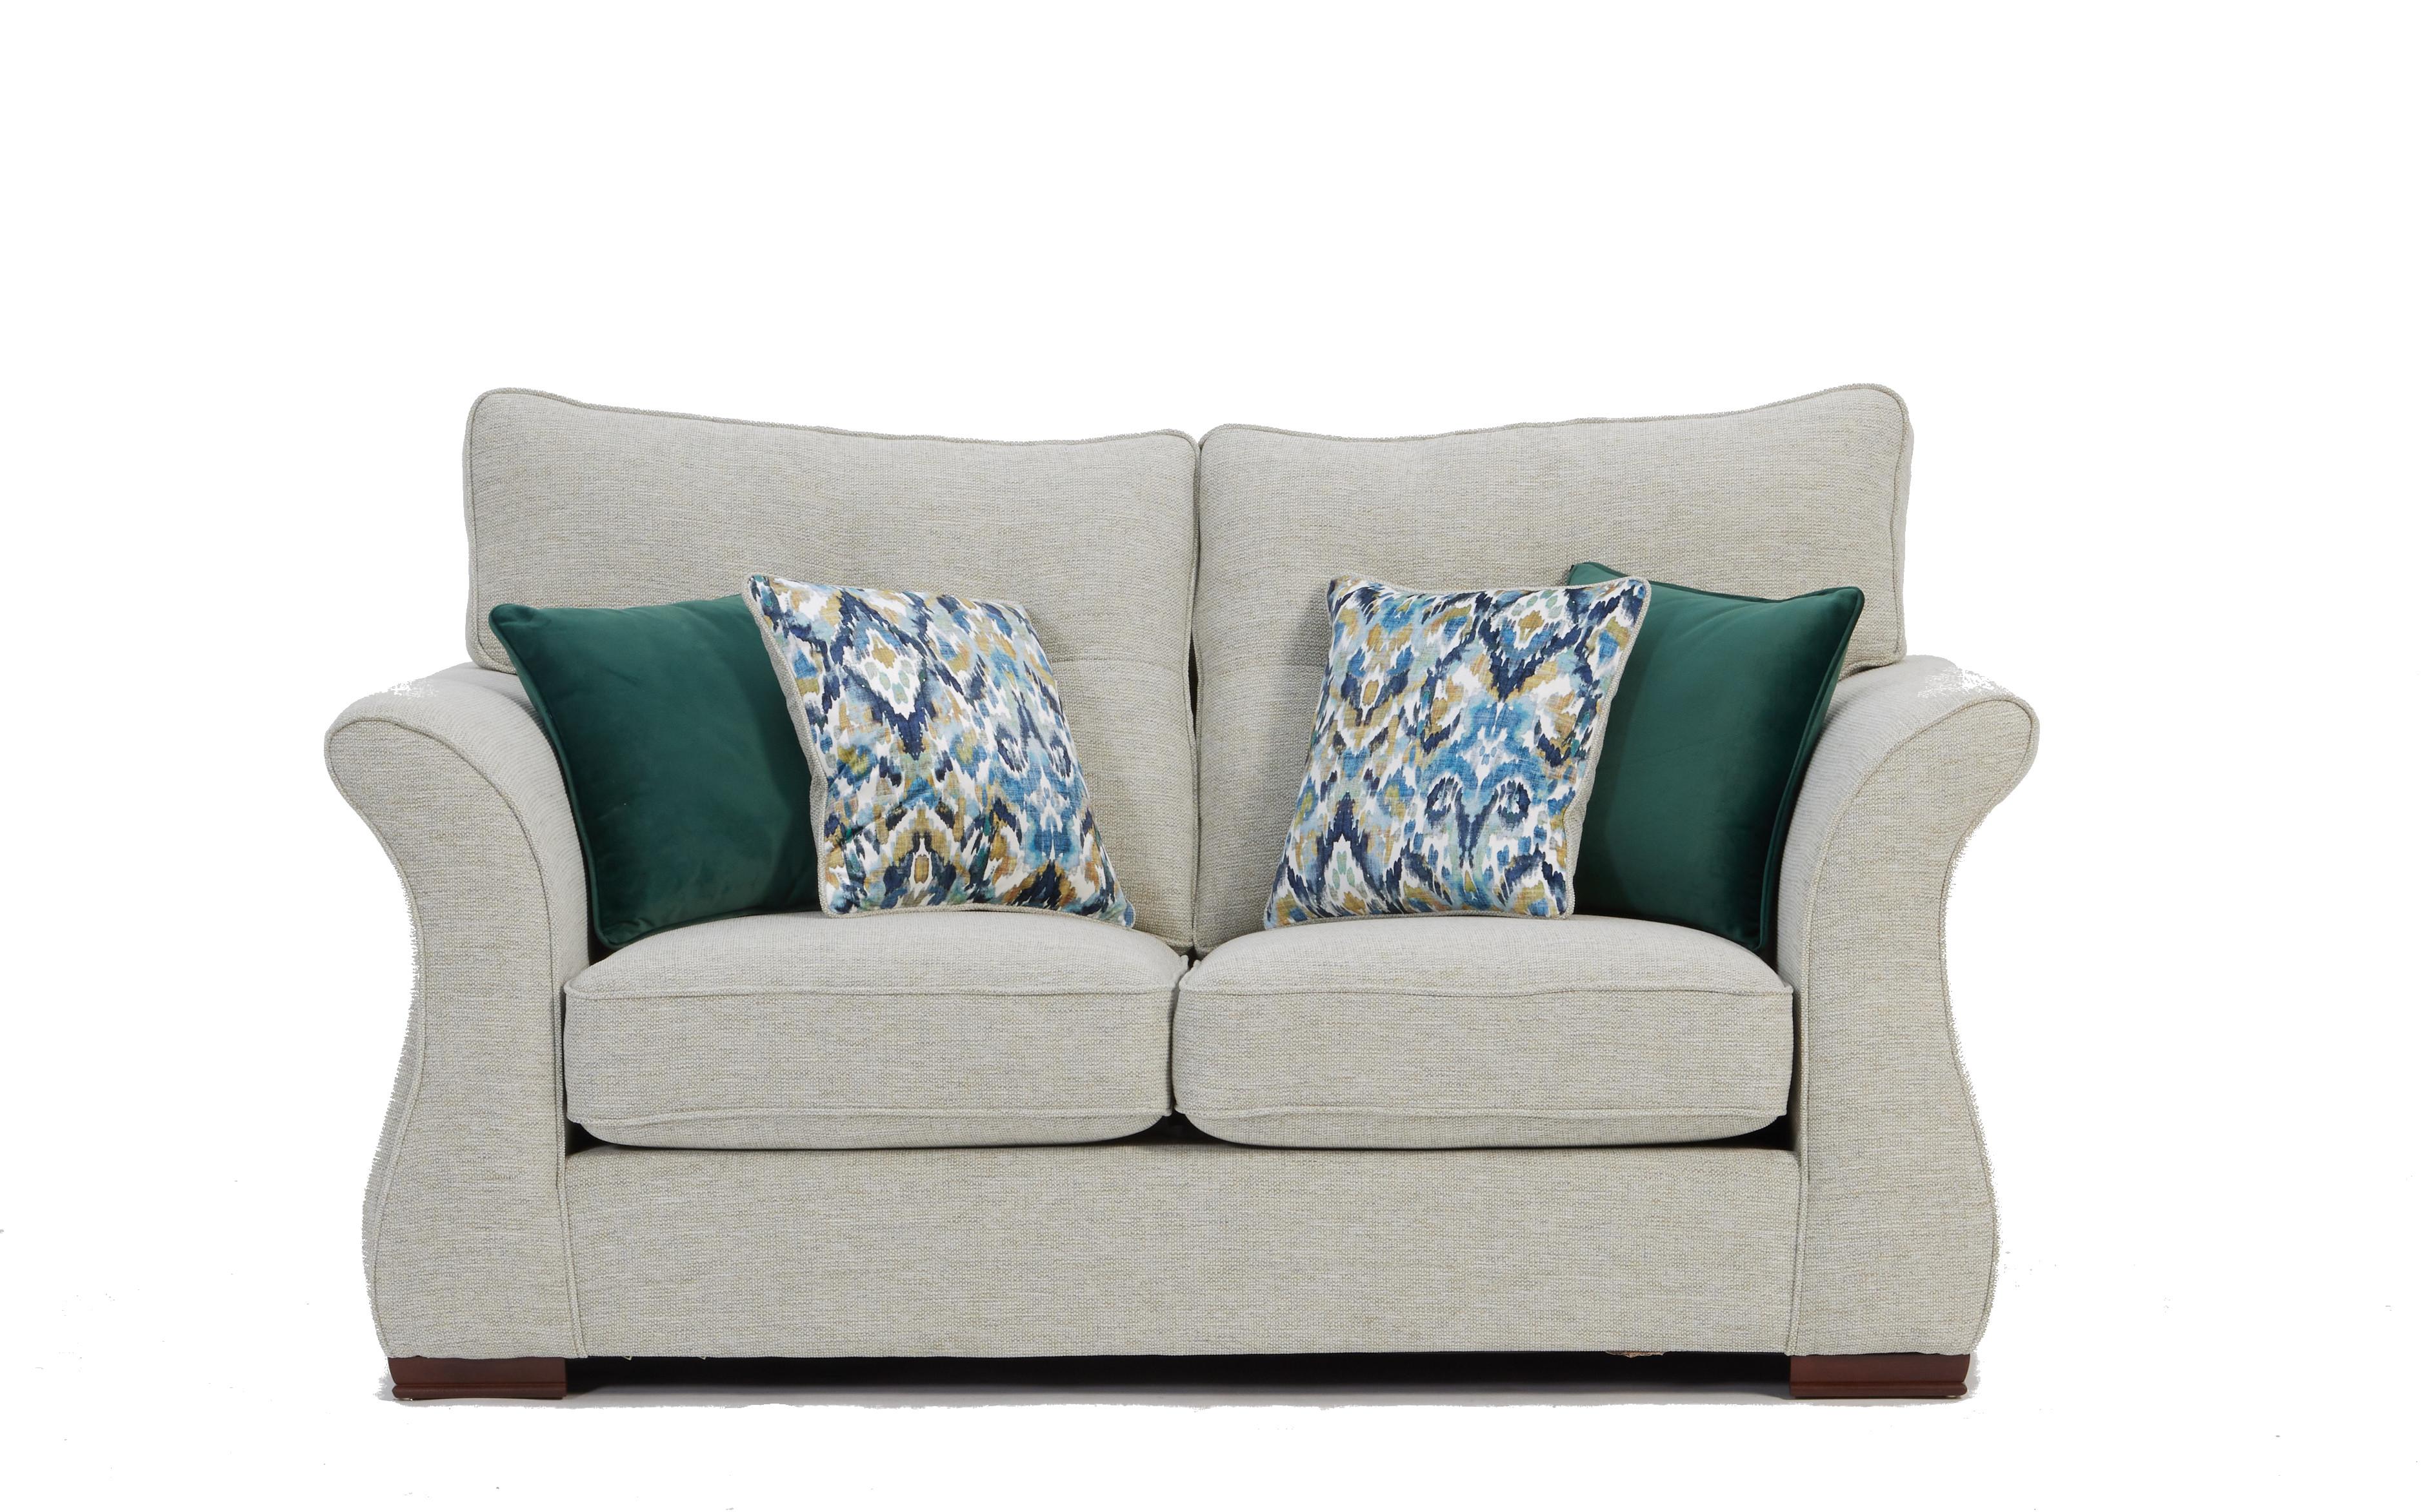 Woodland 2 Seater Sofa